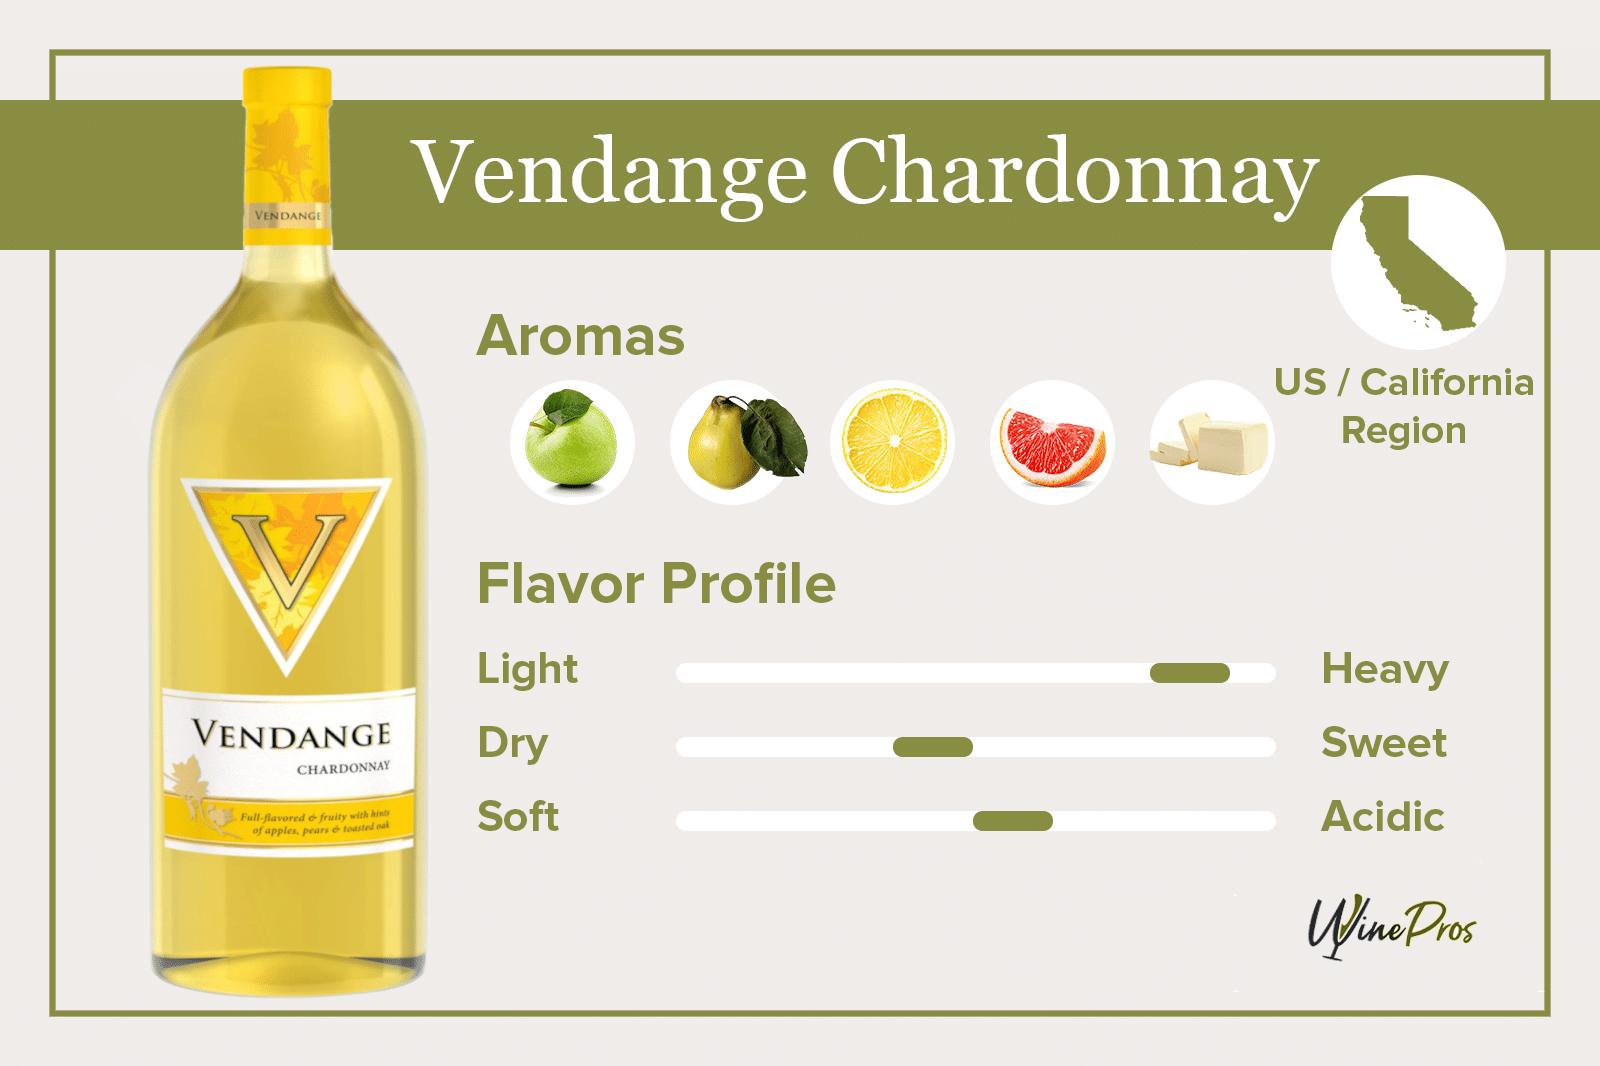 Vendange Chardonnay Featured